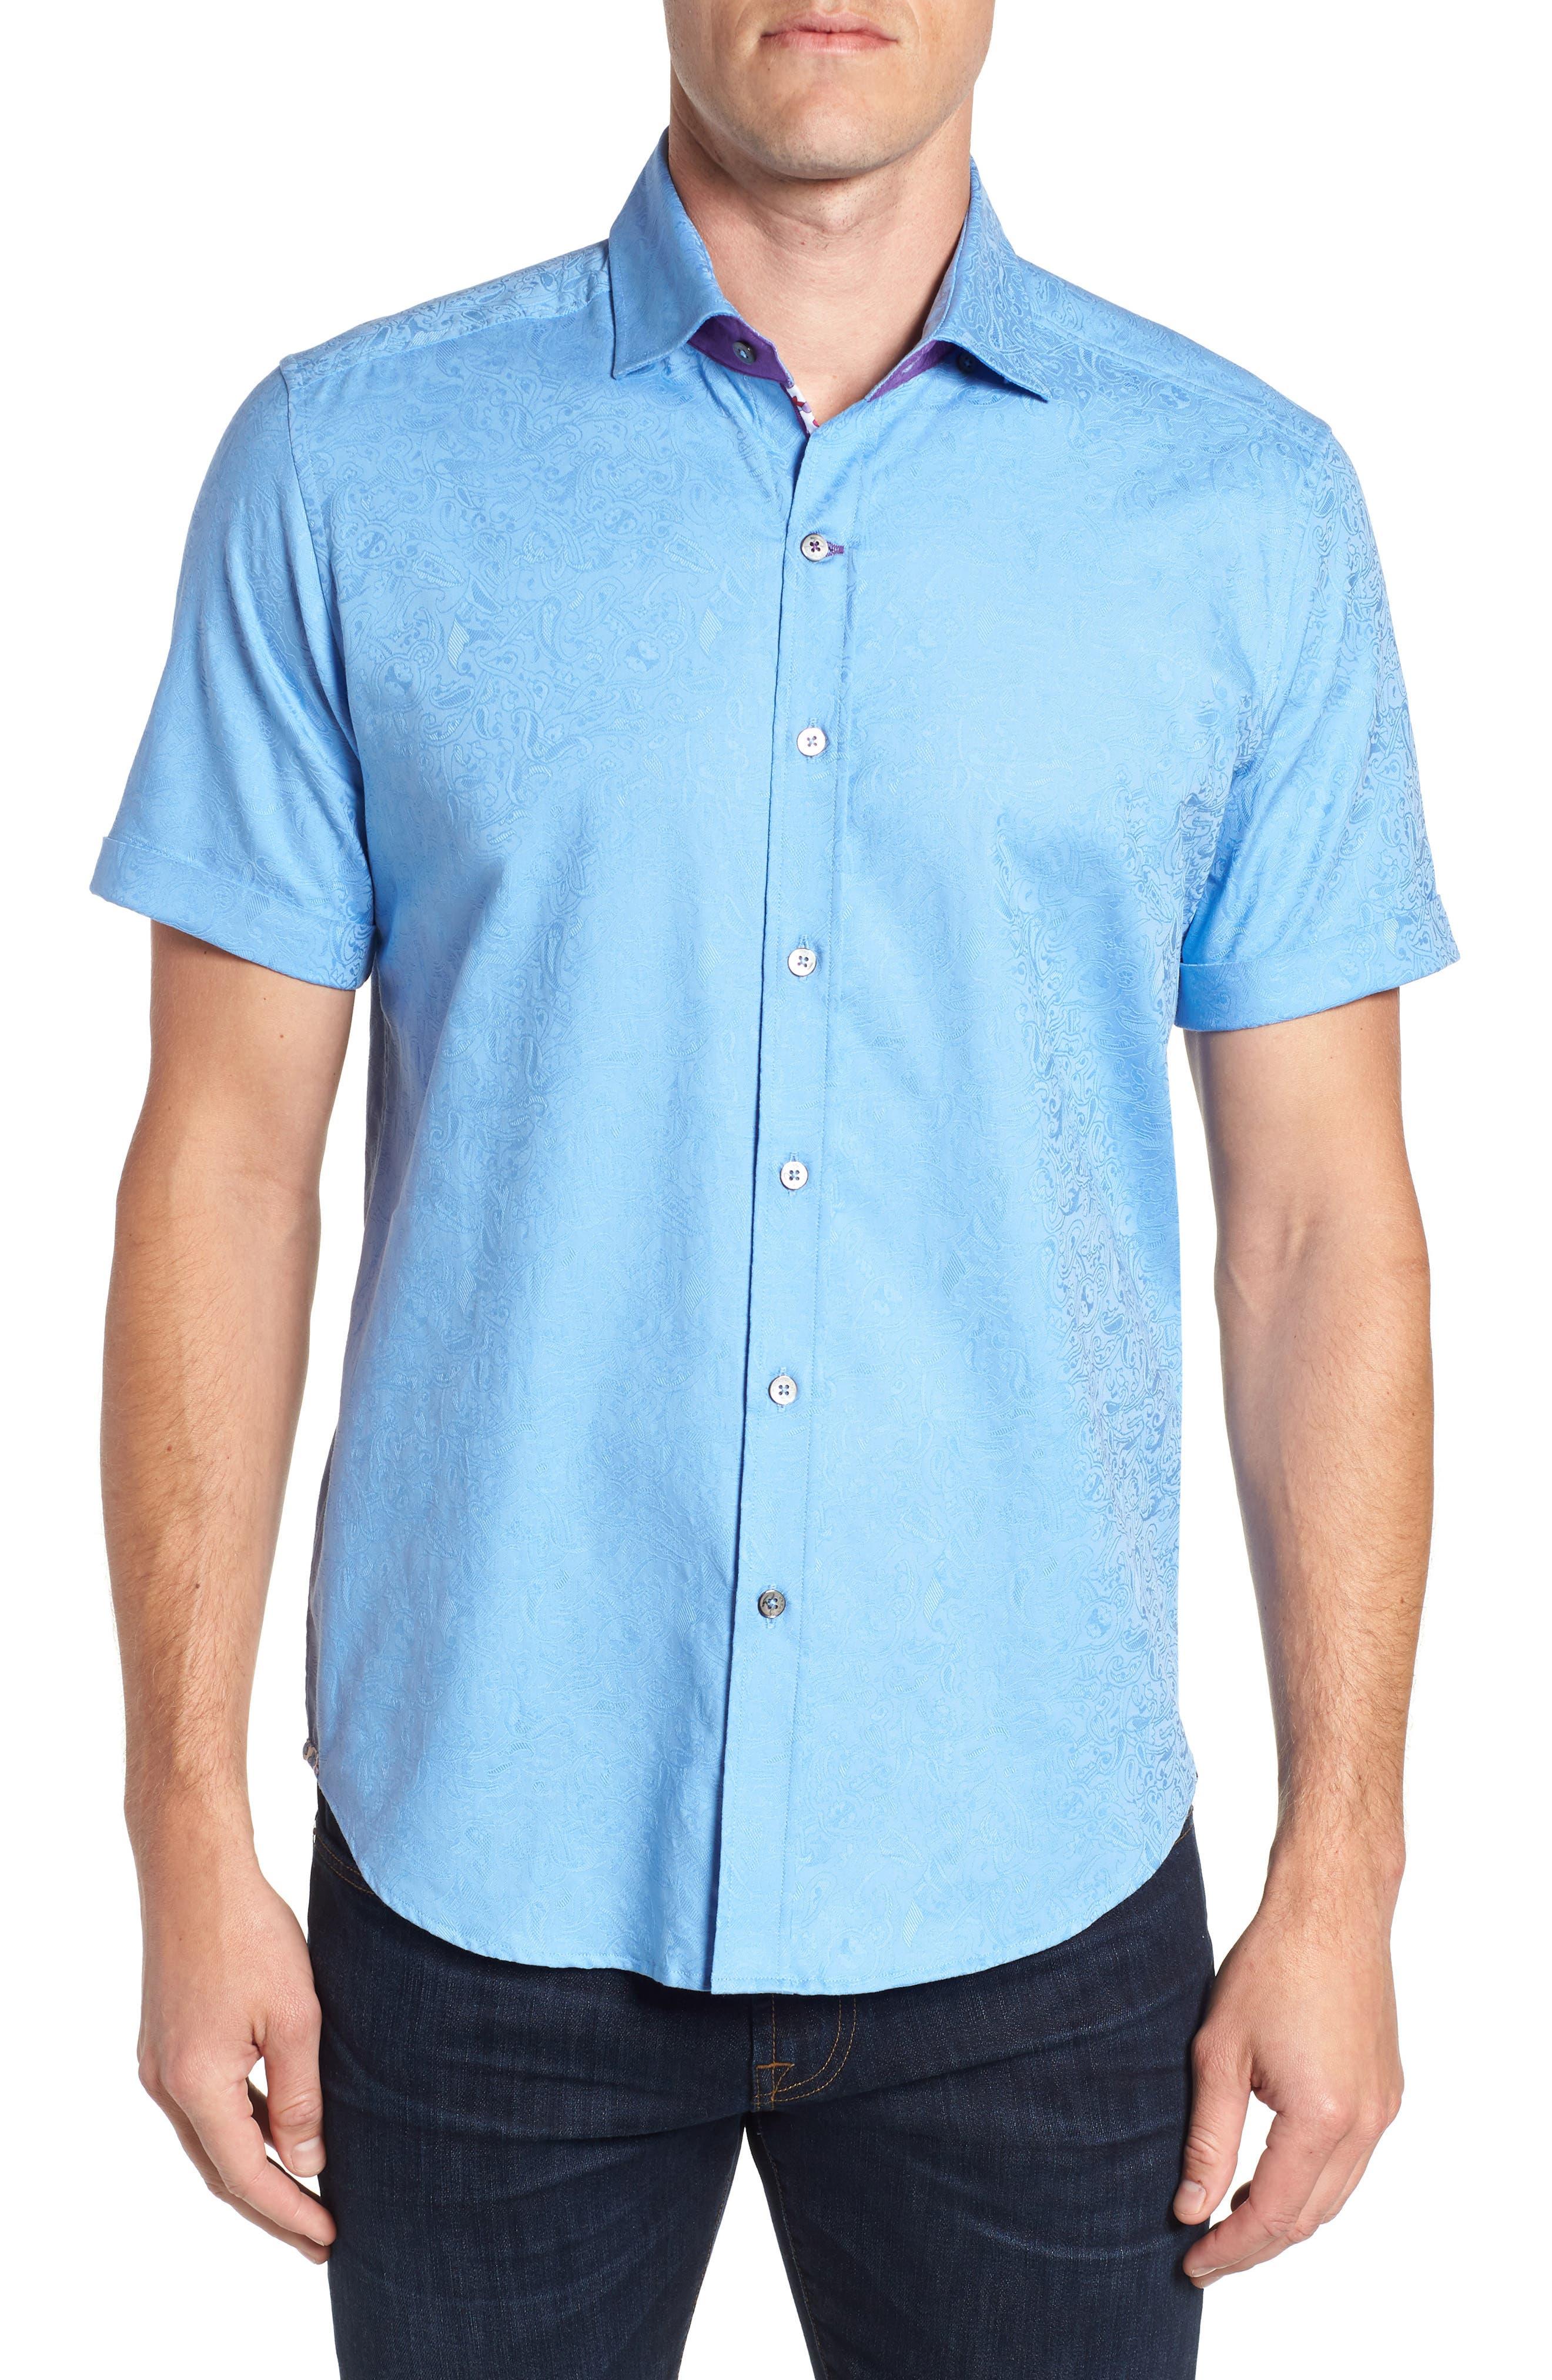 Abbott Sport Shirt,                             Main thumbnail 1, color,                             Blue